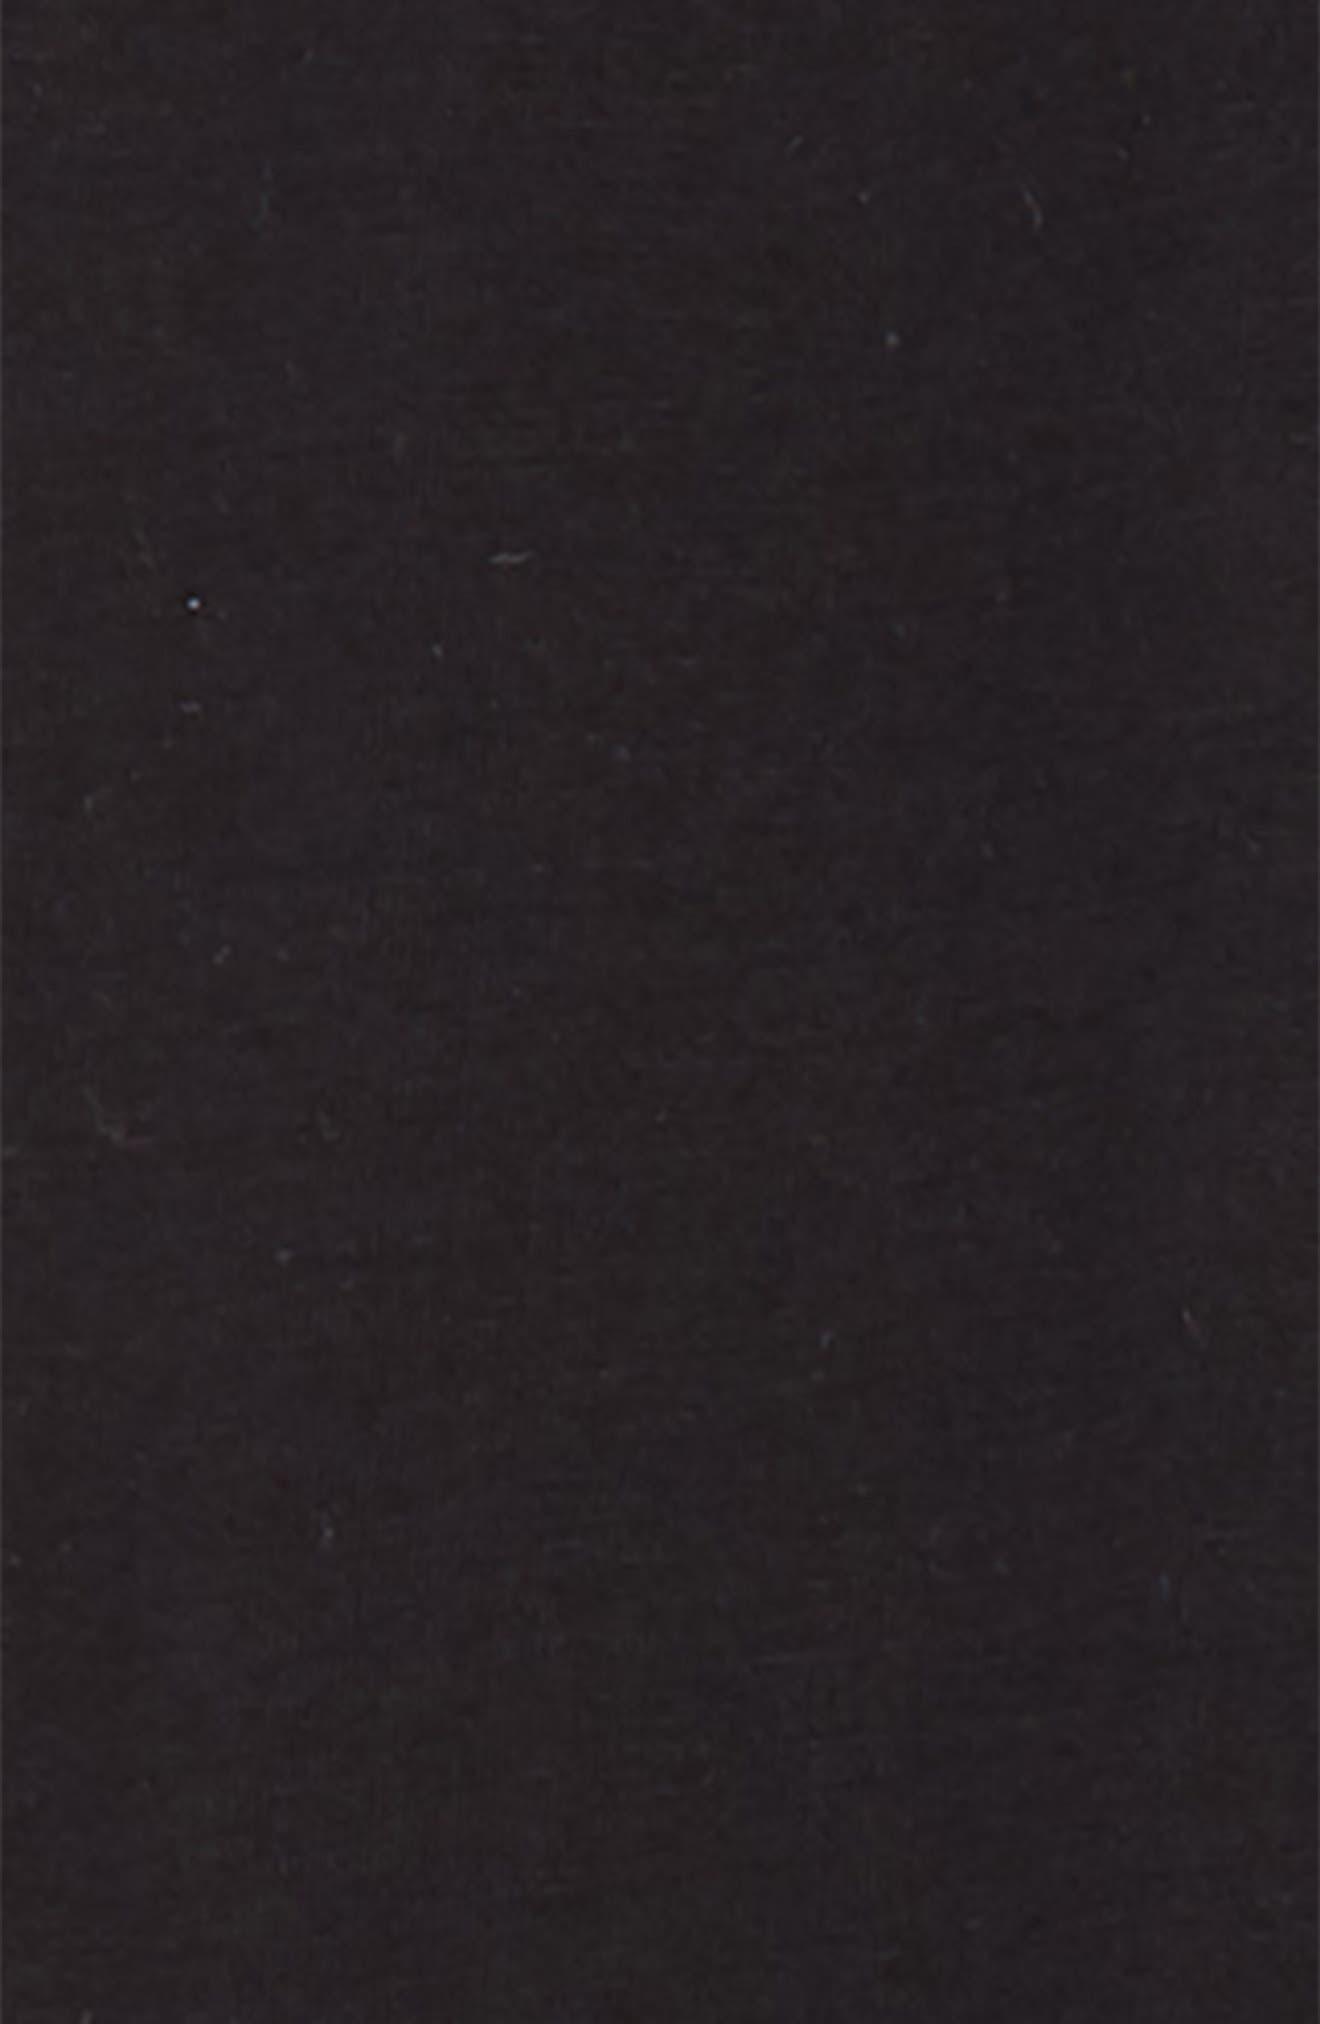 Briana Flutter Pants,                             Alternate thumbnail 2, color,                             Black